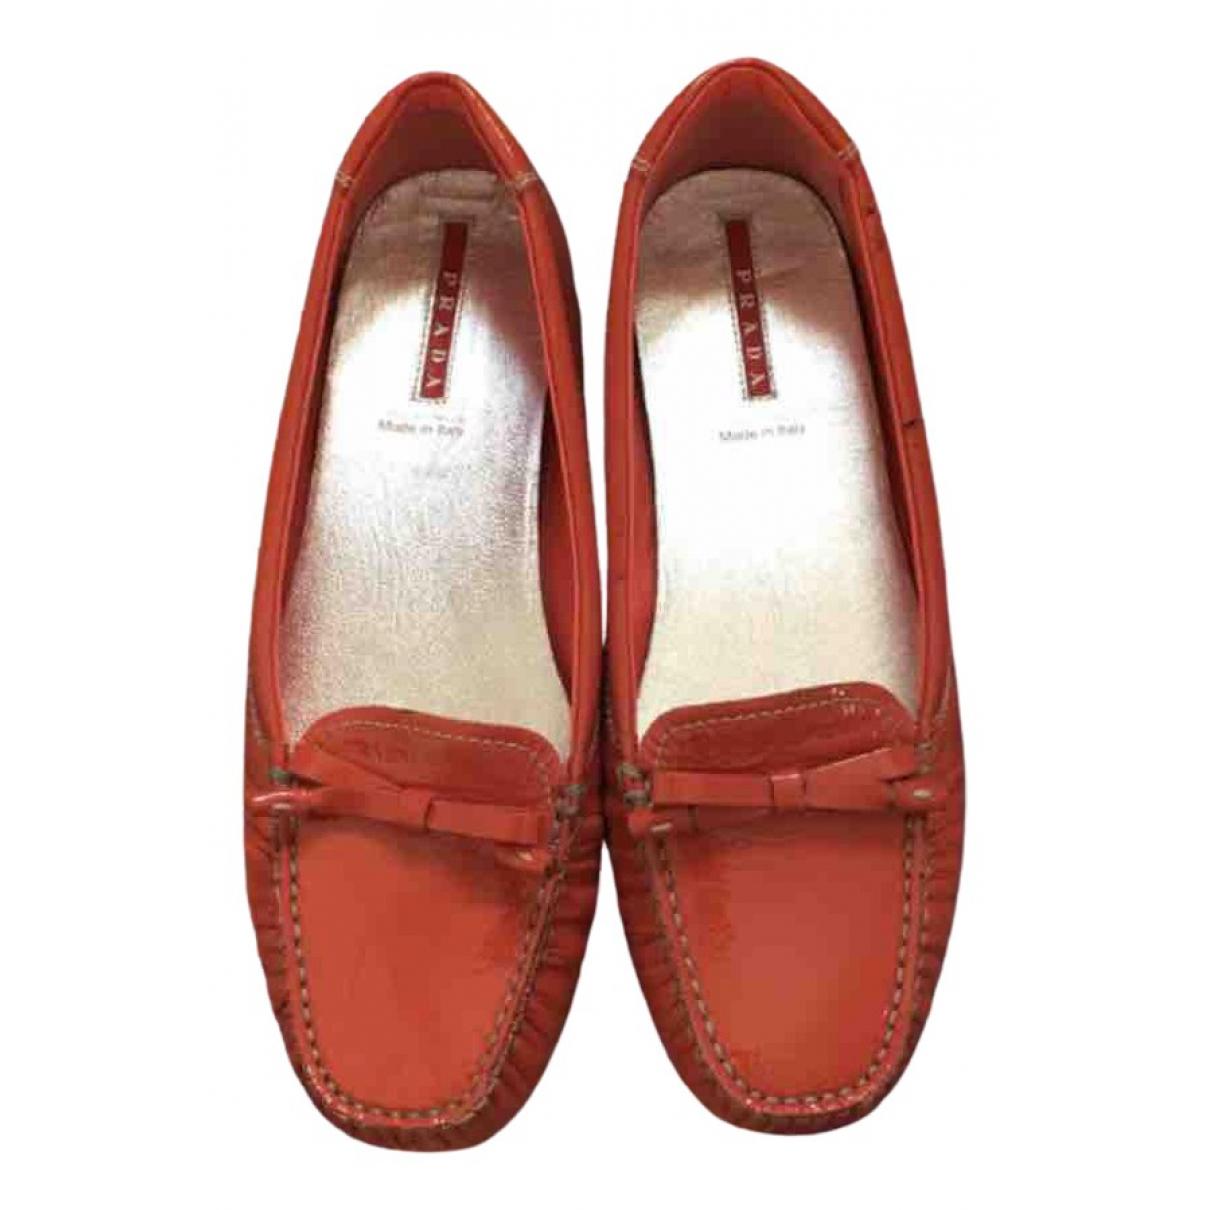 Prada \N Orange Patent leather Flats for Women 36.5 IT